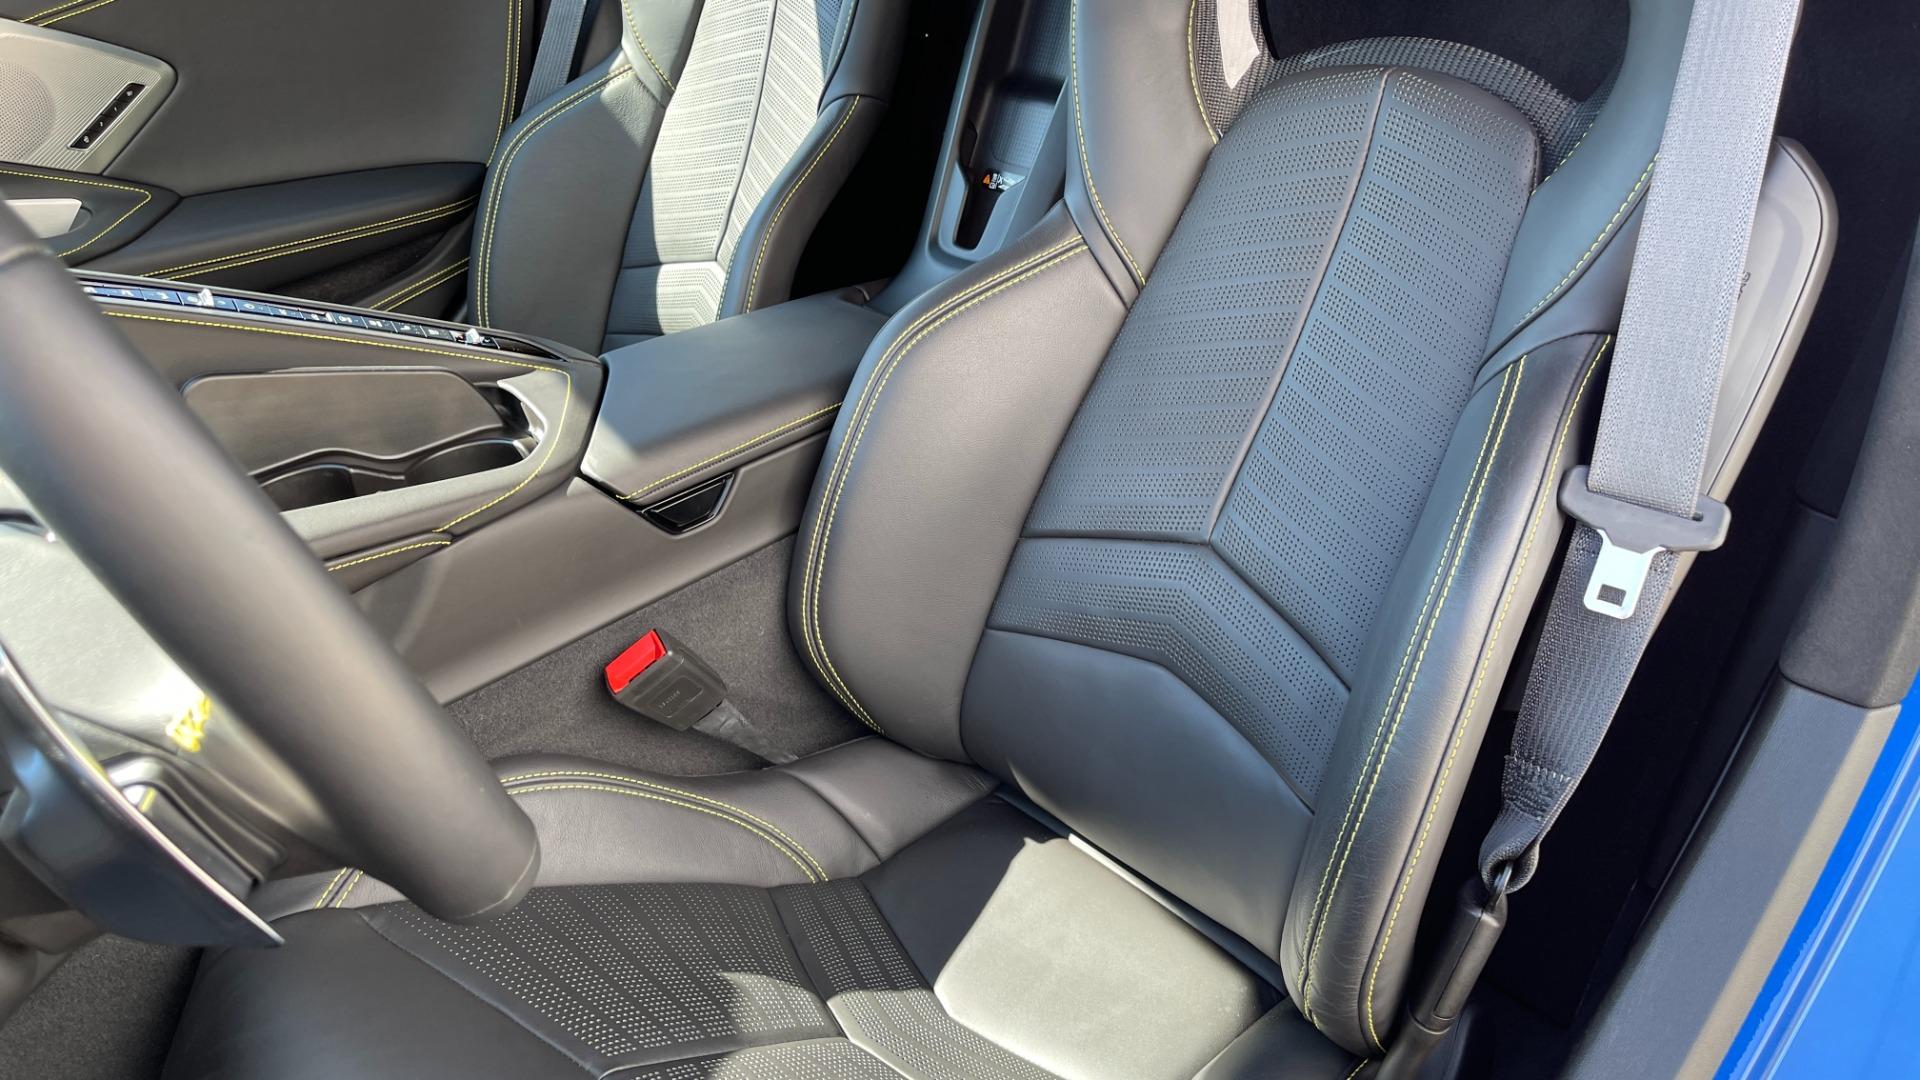 Used 2021 Chevrolet CORVETTE STINGRAY 3LT COUPE / 8-SPD / PERF PKG / NAV / BOSE / REARVIEW for sale $110,995 at Formula Imports in Charlotte NC 28227 9